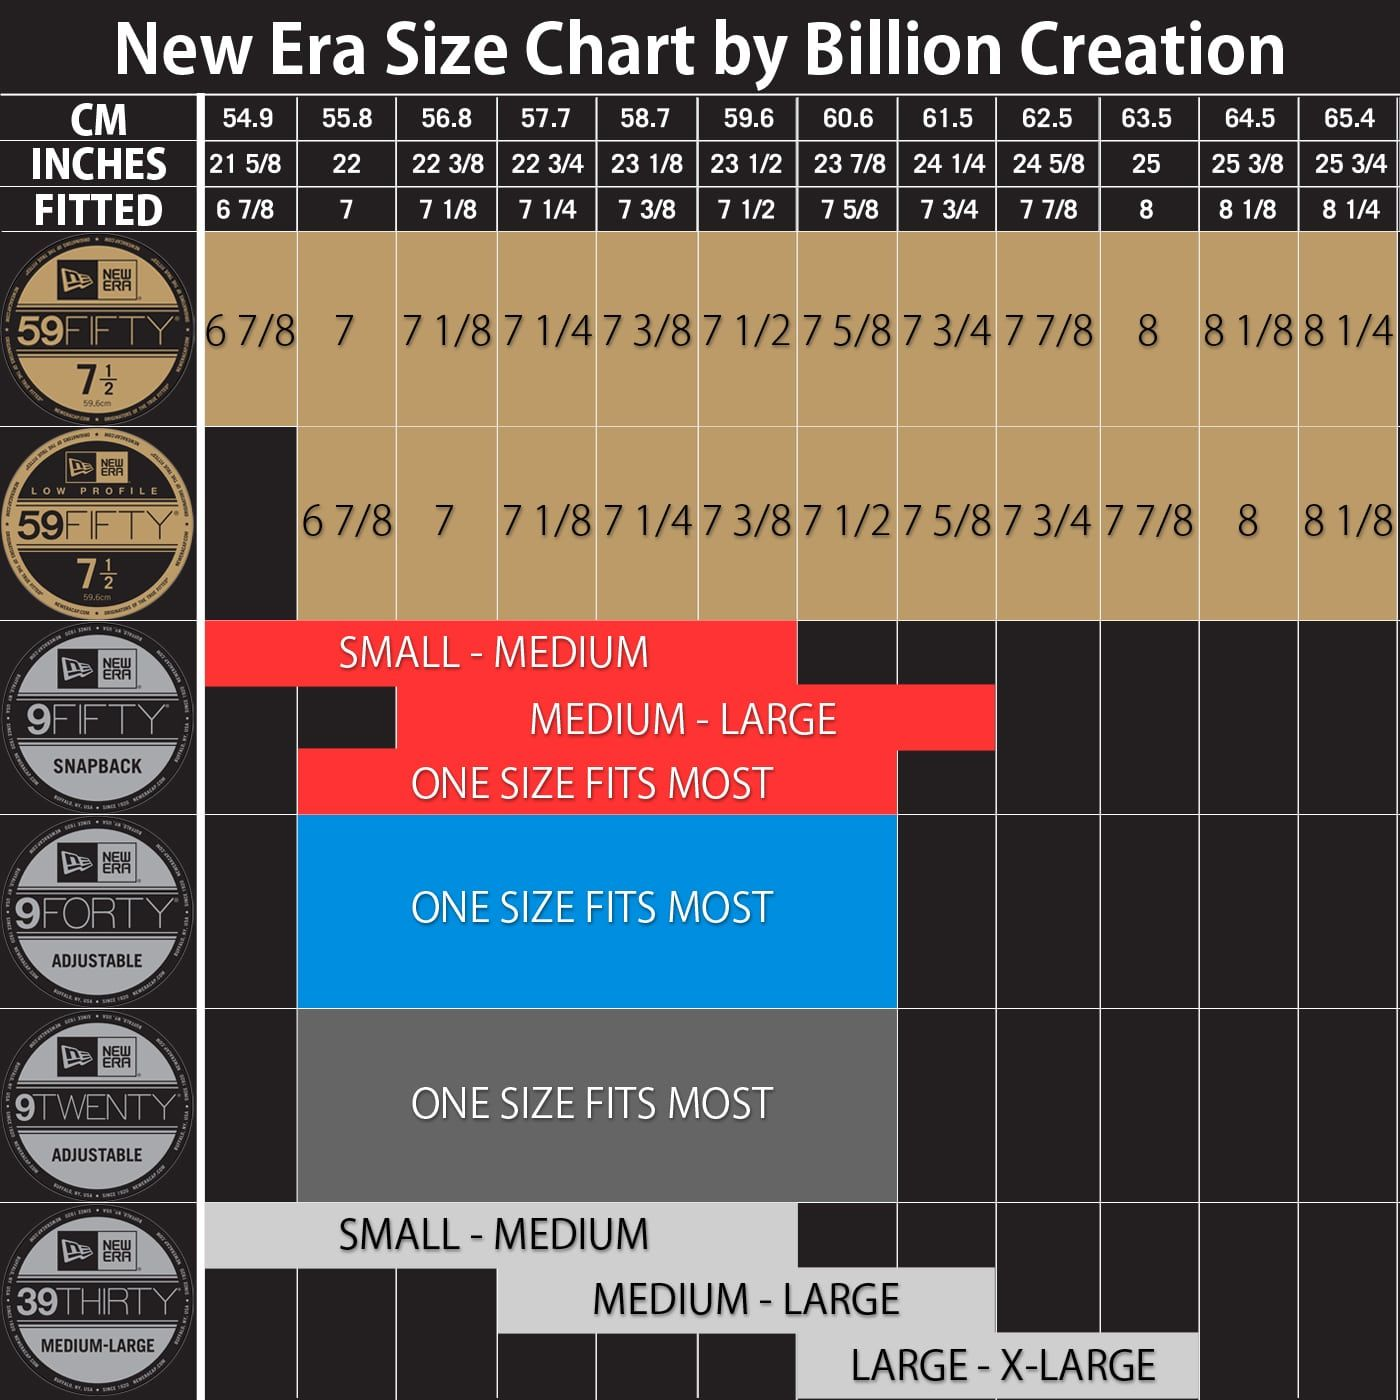 New Era Hat Sizes The Ultimate New Era Cap Size Guide New Era Hats New Era Chart